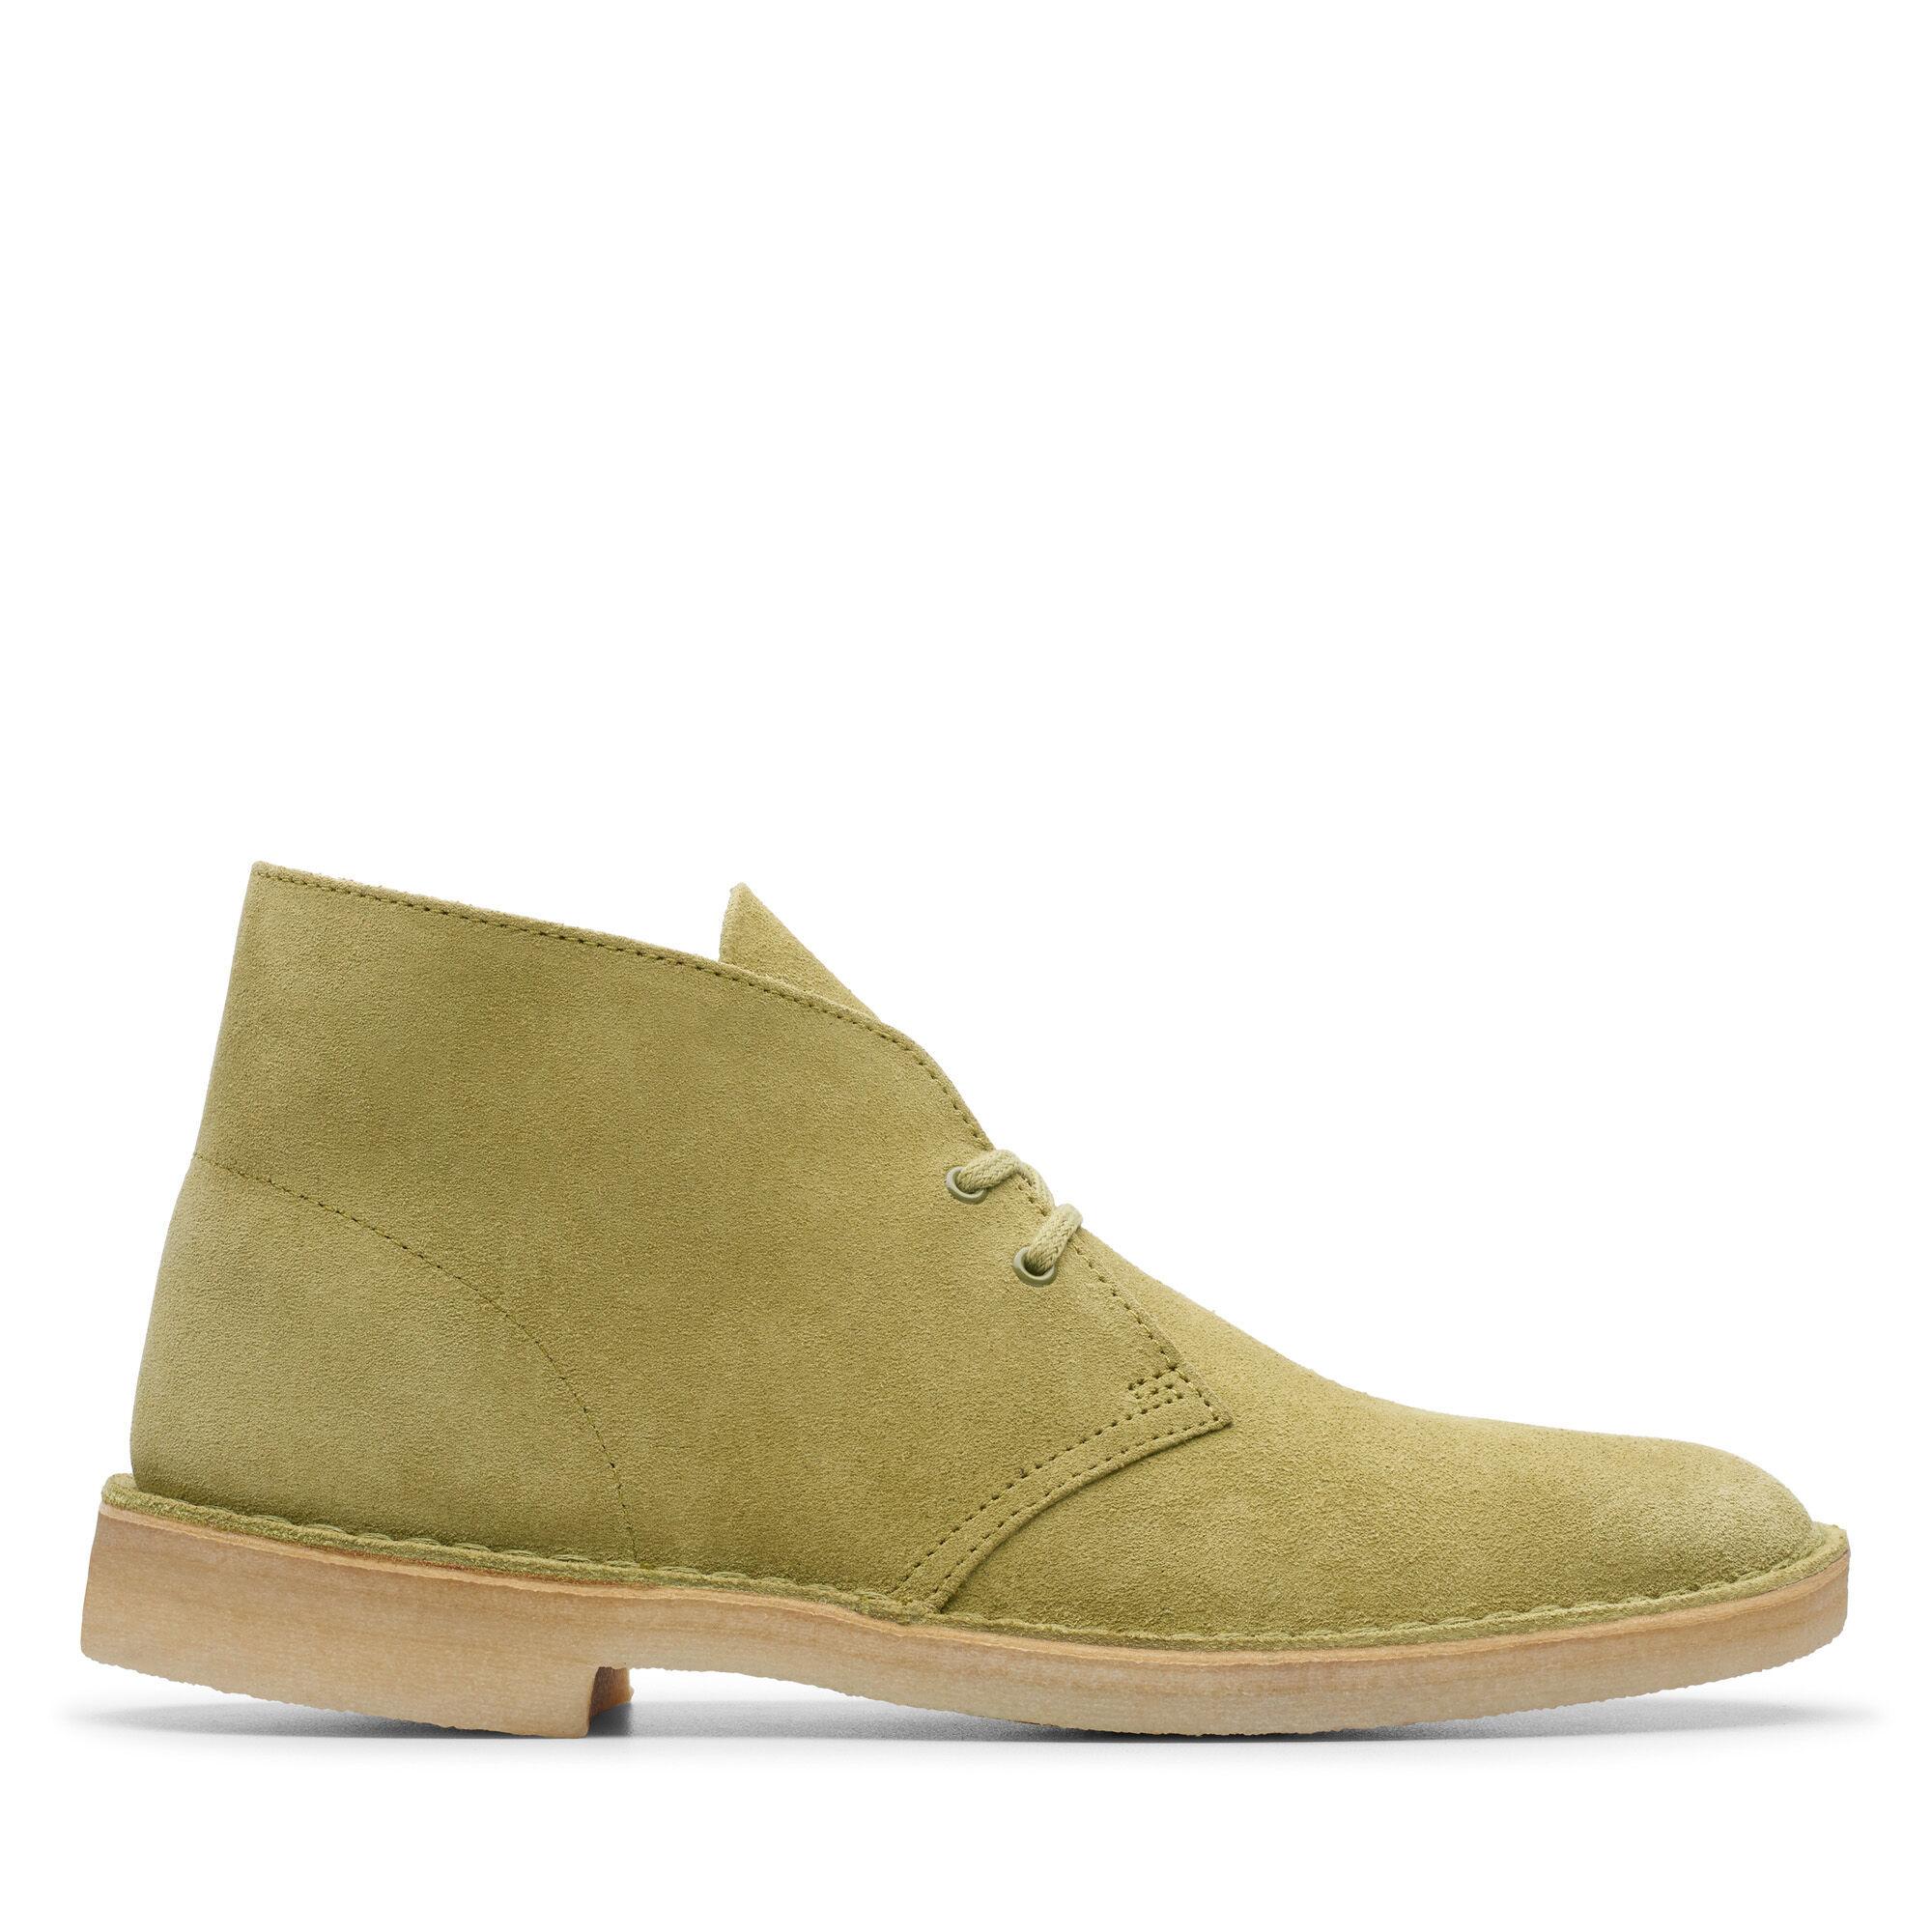 Men's Khaki Suede Desert Boots Desert Boot | Clarks